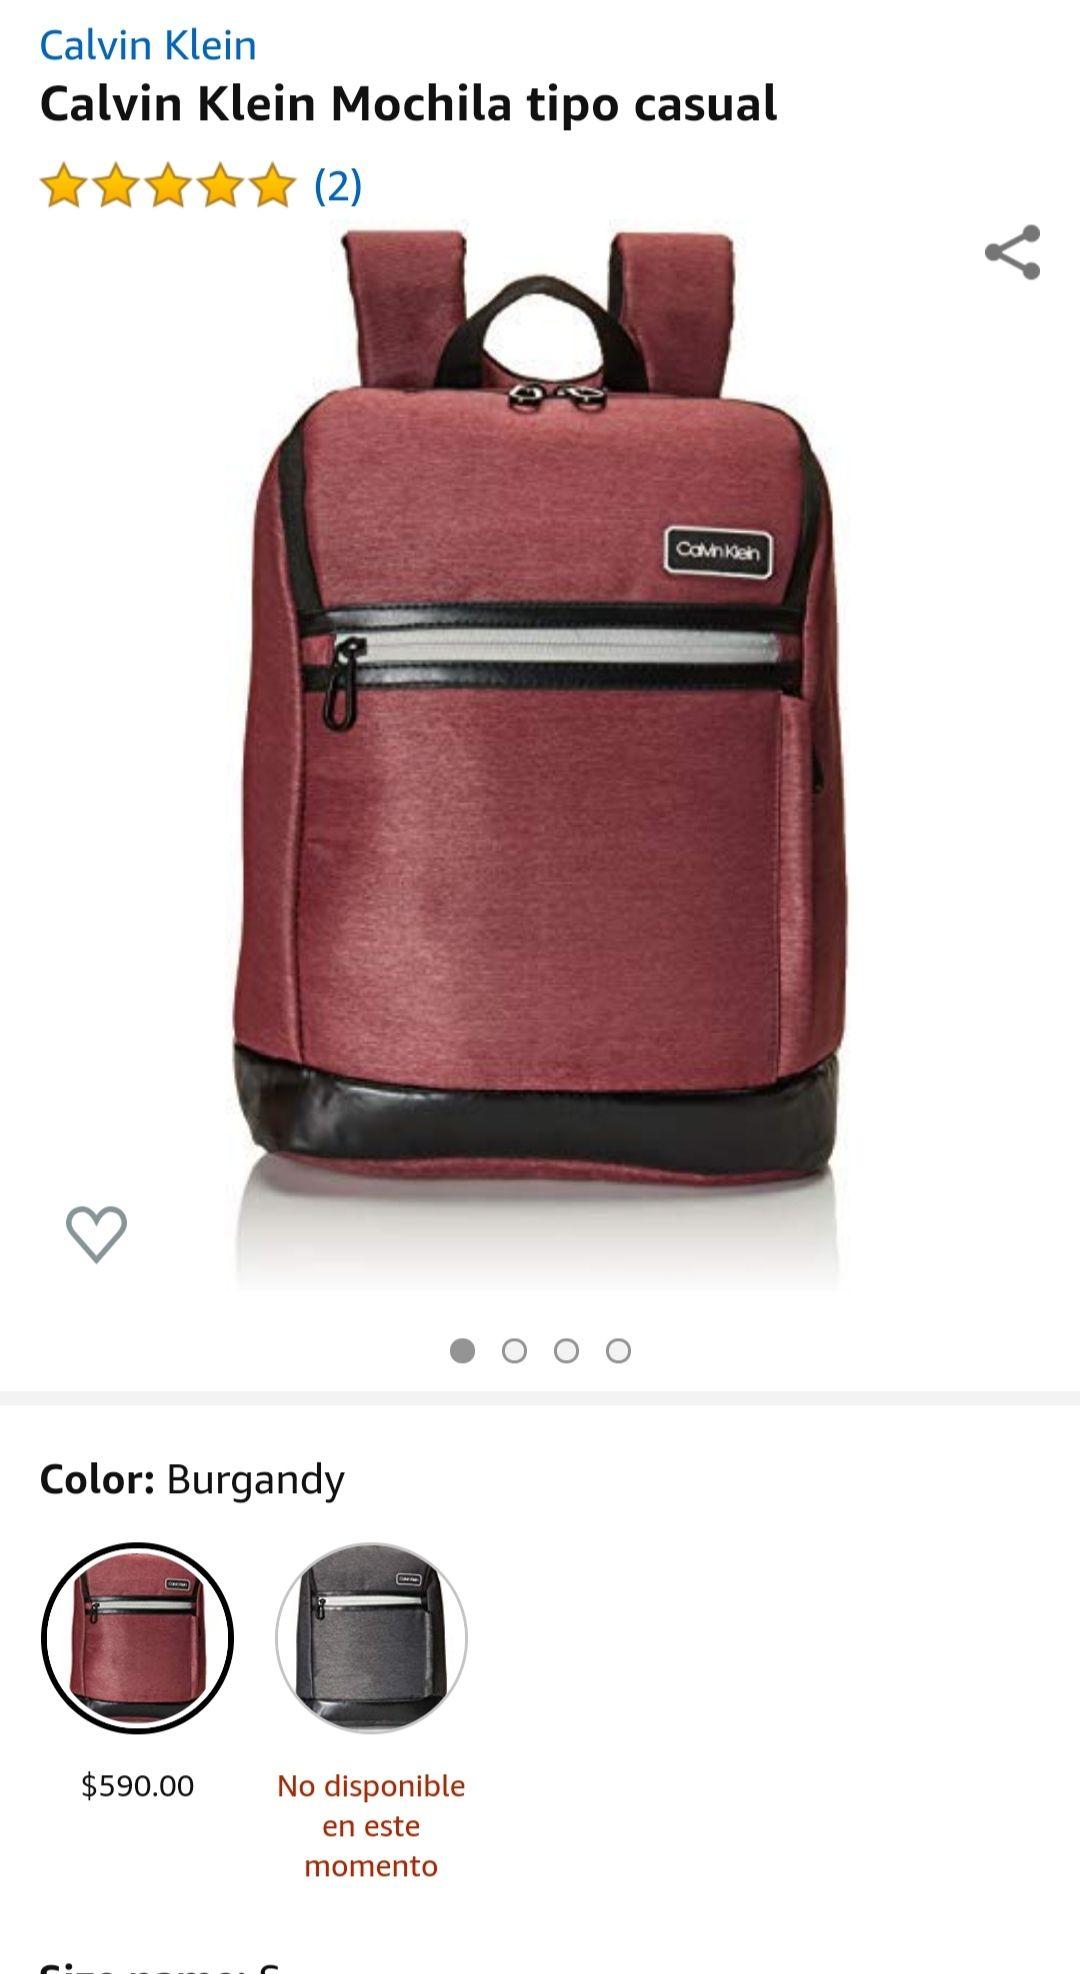 Amazon: Mochila Calvin Klein